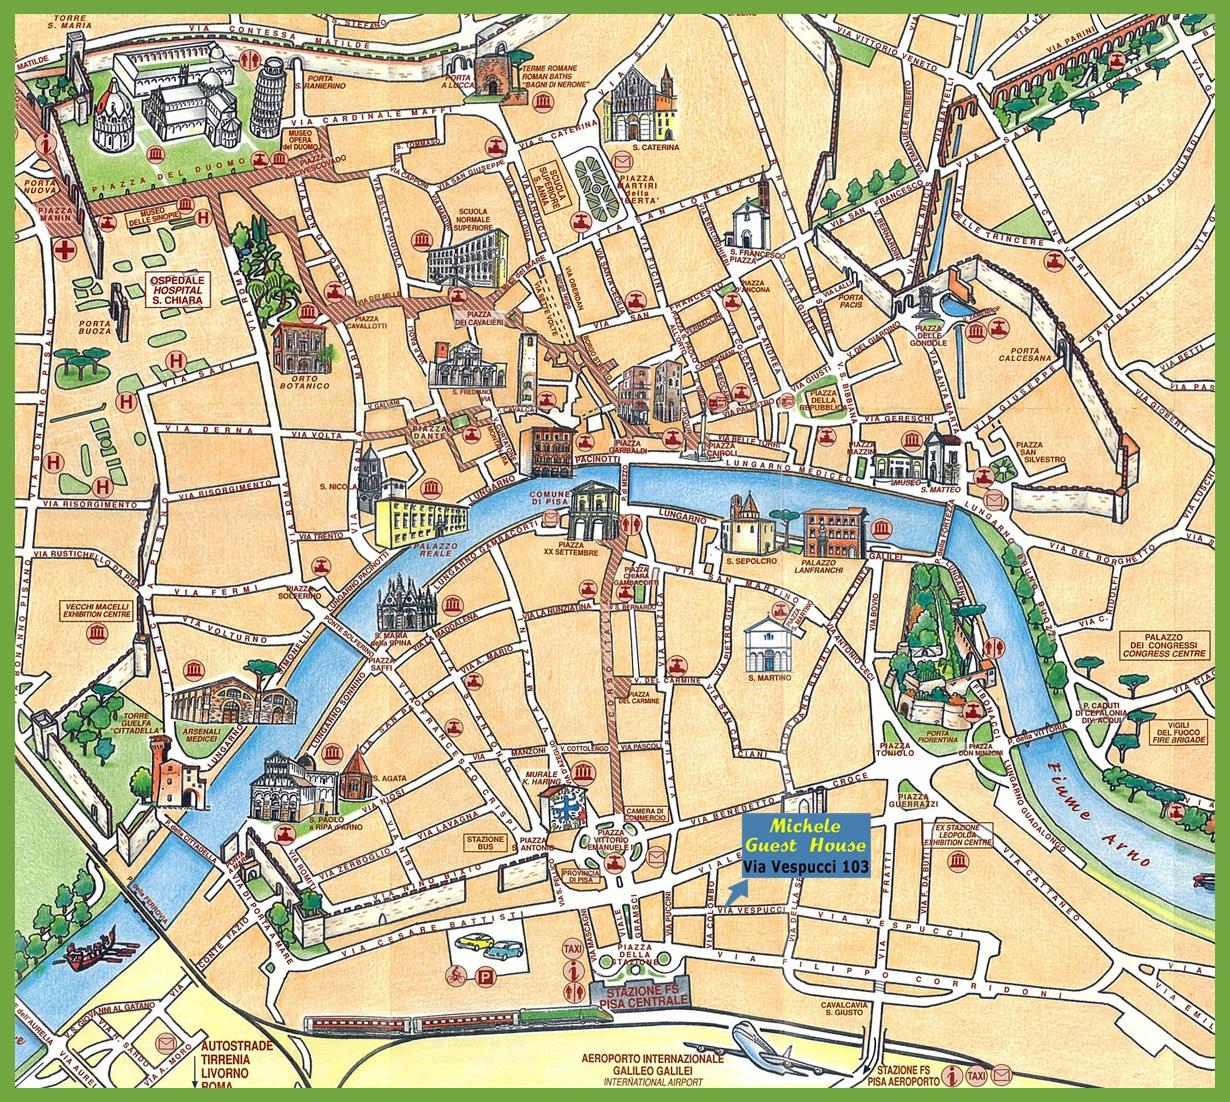 Map Of Pisa Italy Pisa Attractions Map PDF   FREE Printable Tourist Map Pisa, Waking